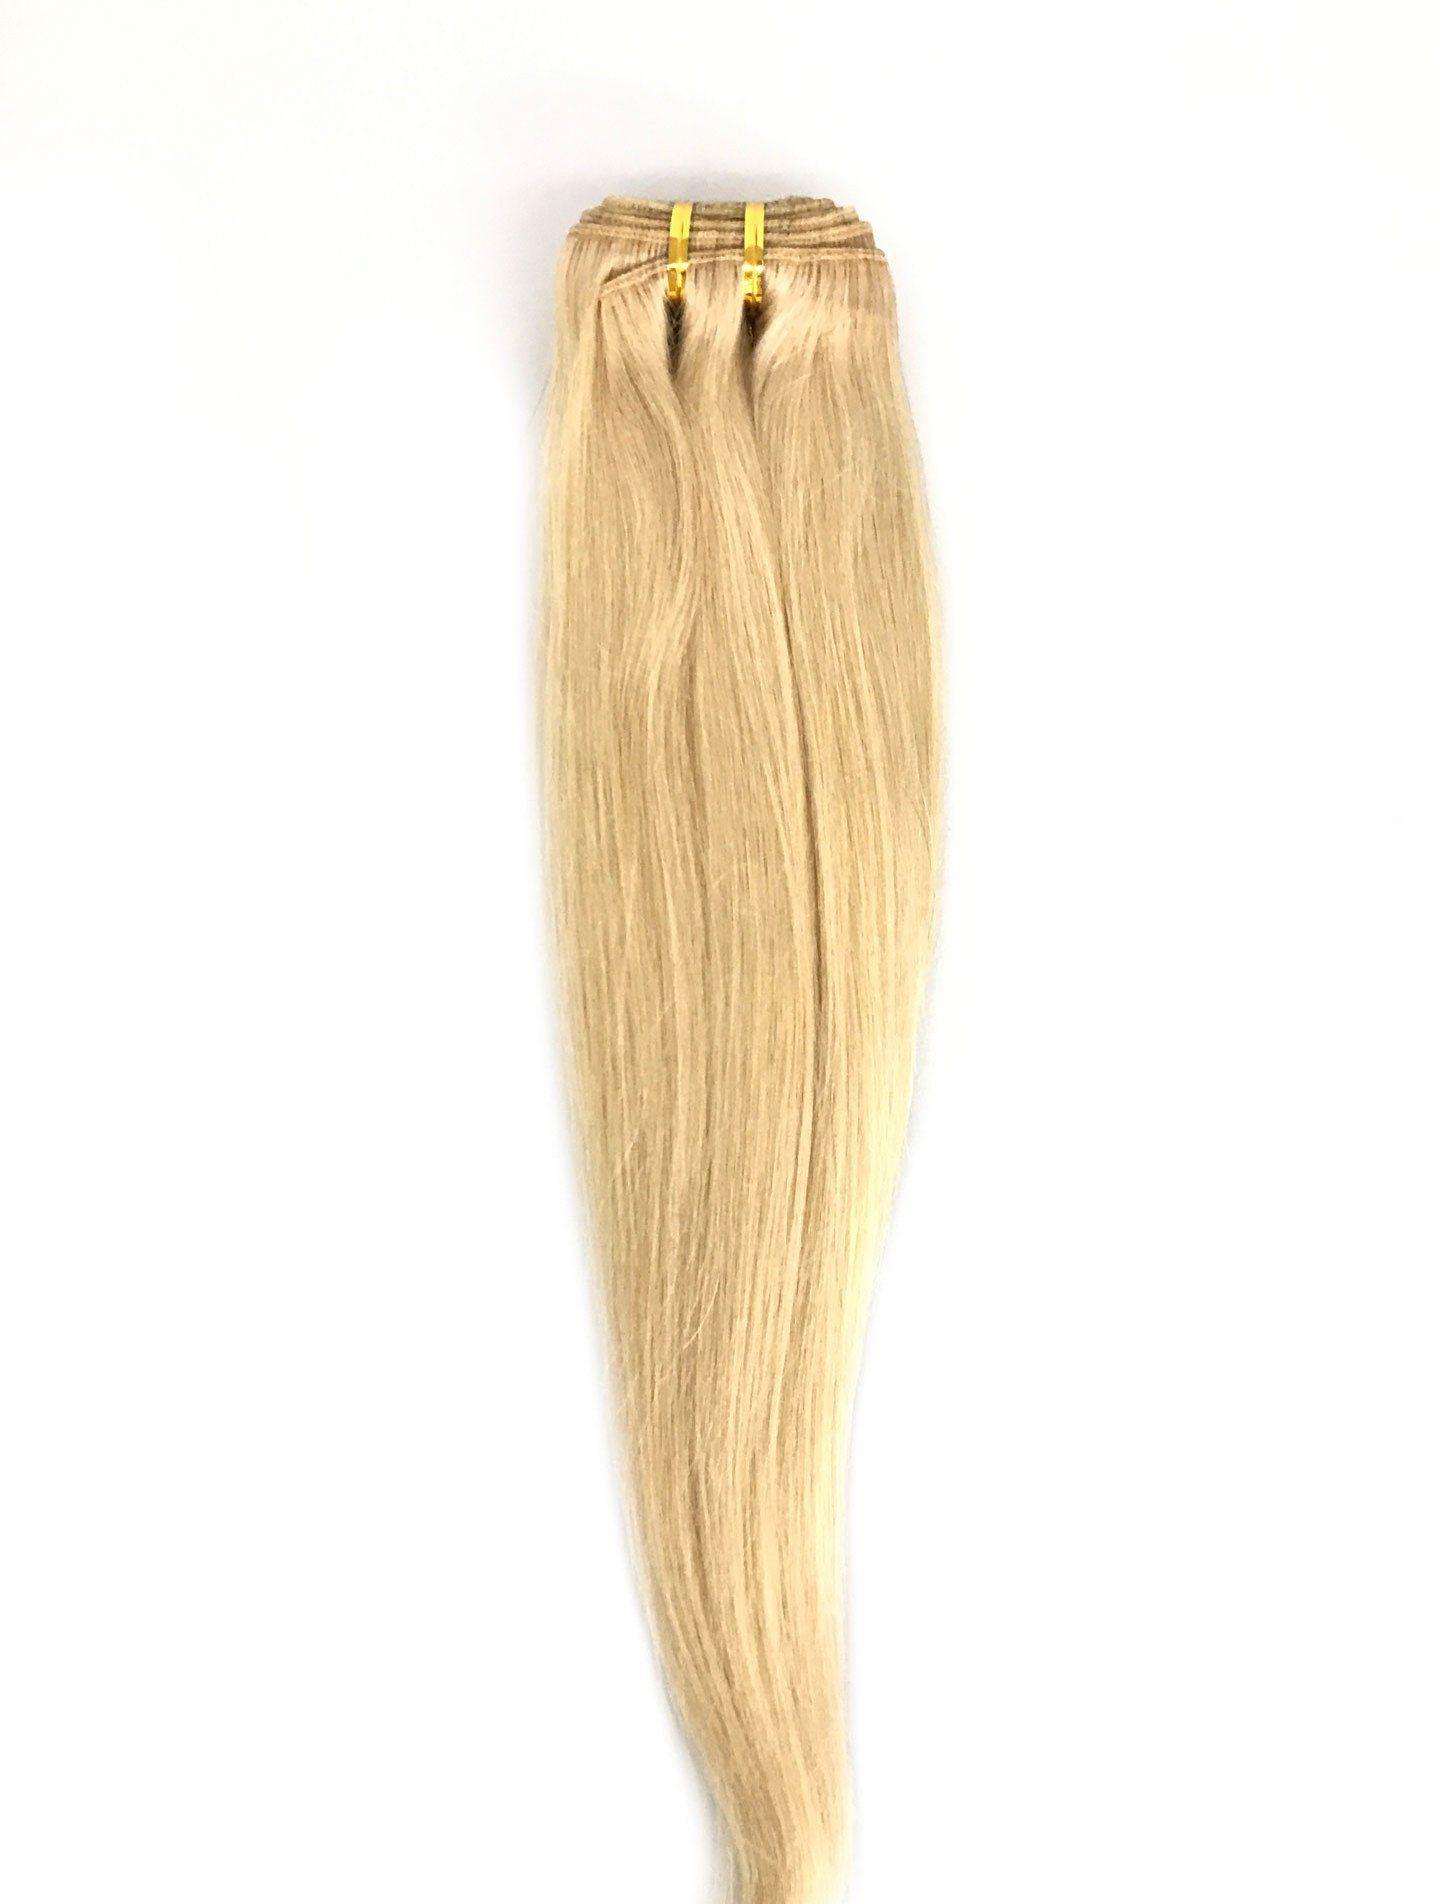 9a Malaysian Straight Human Hair Extension Platinum Blonde Human